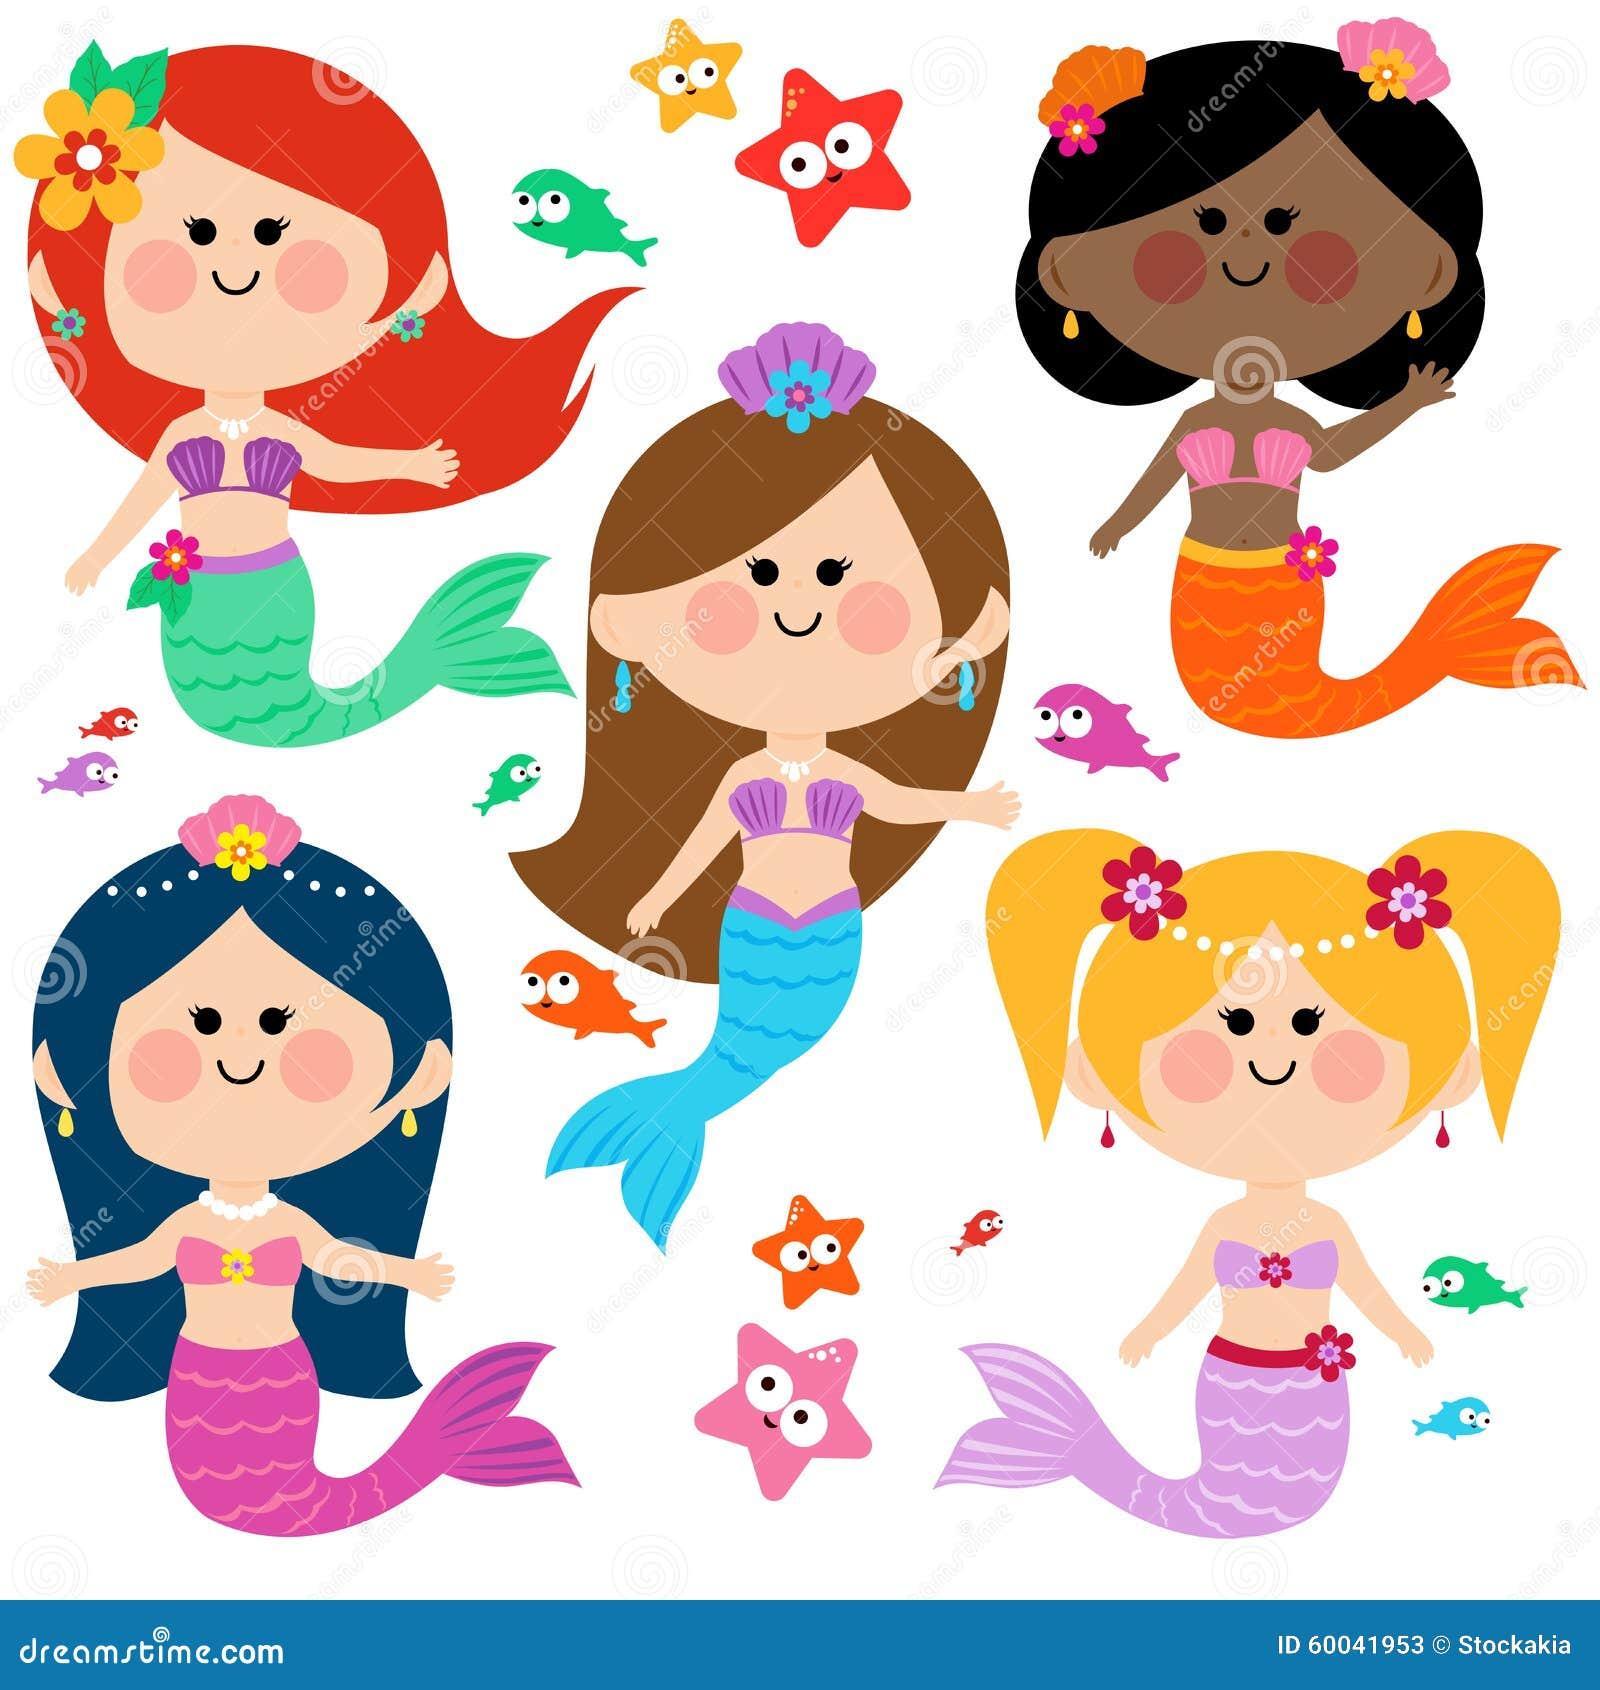 Cute mermaid vector set stock vector. Illustration of ...